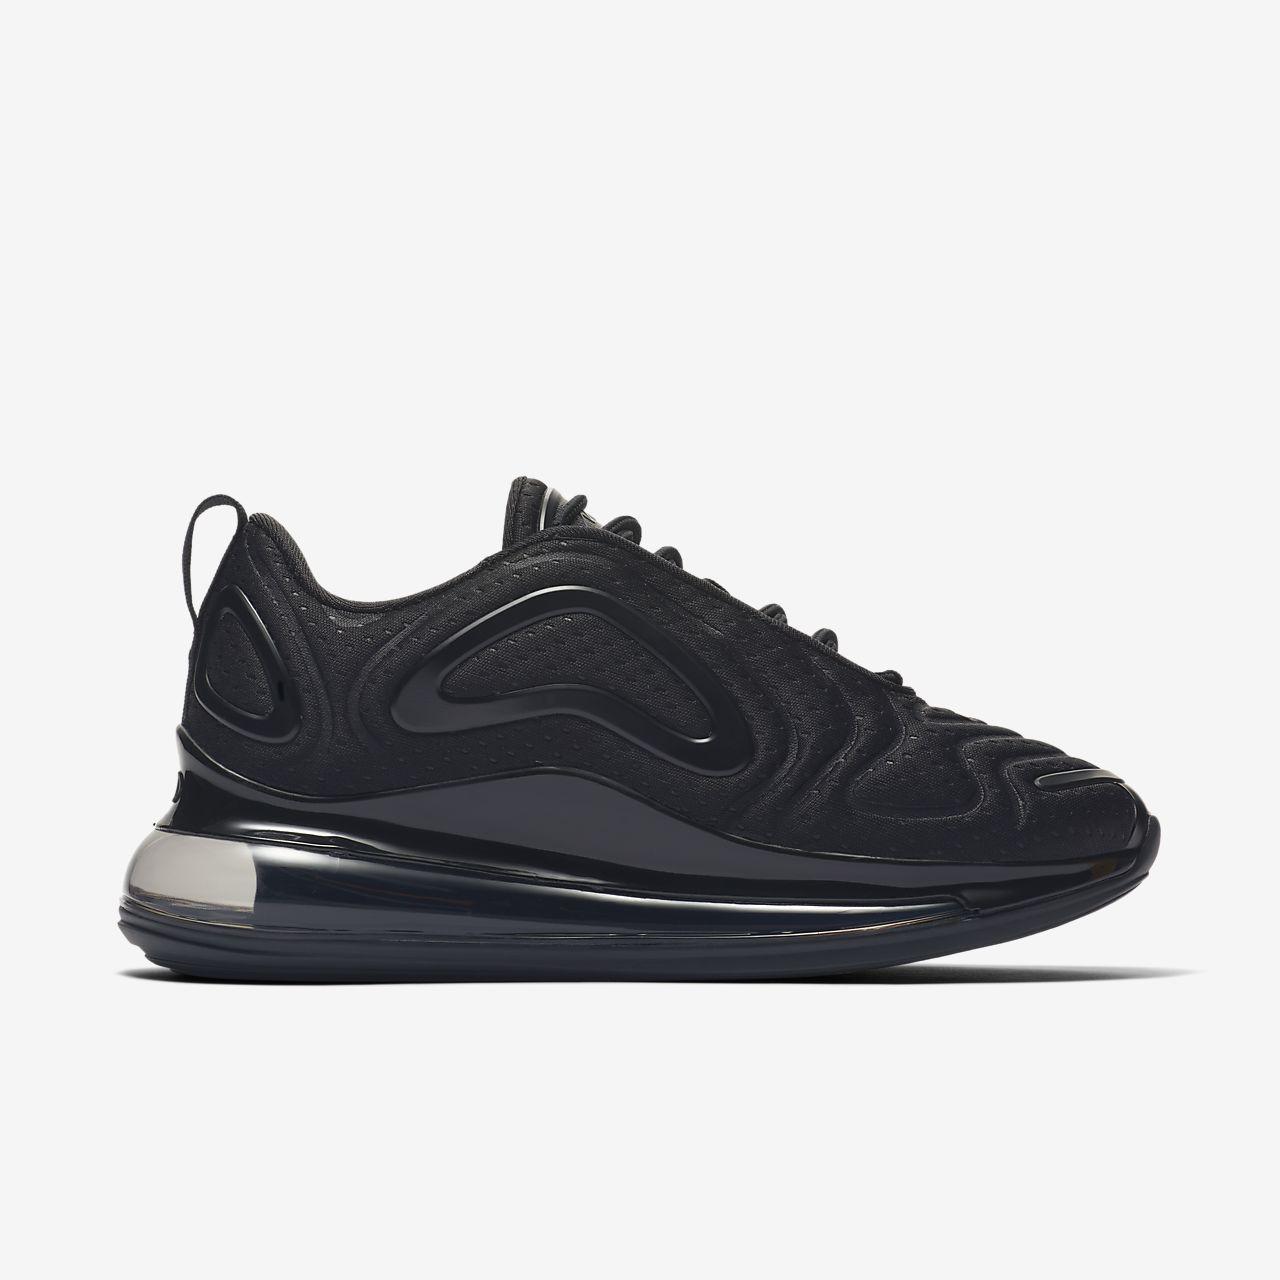 nike air max 720 uomo scarpe black scarpe misura